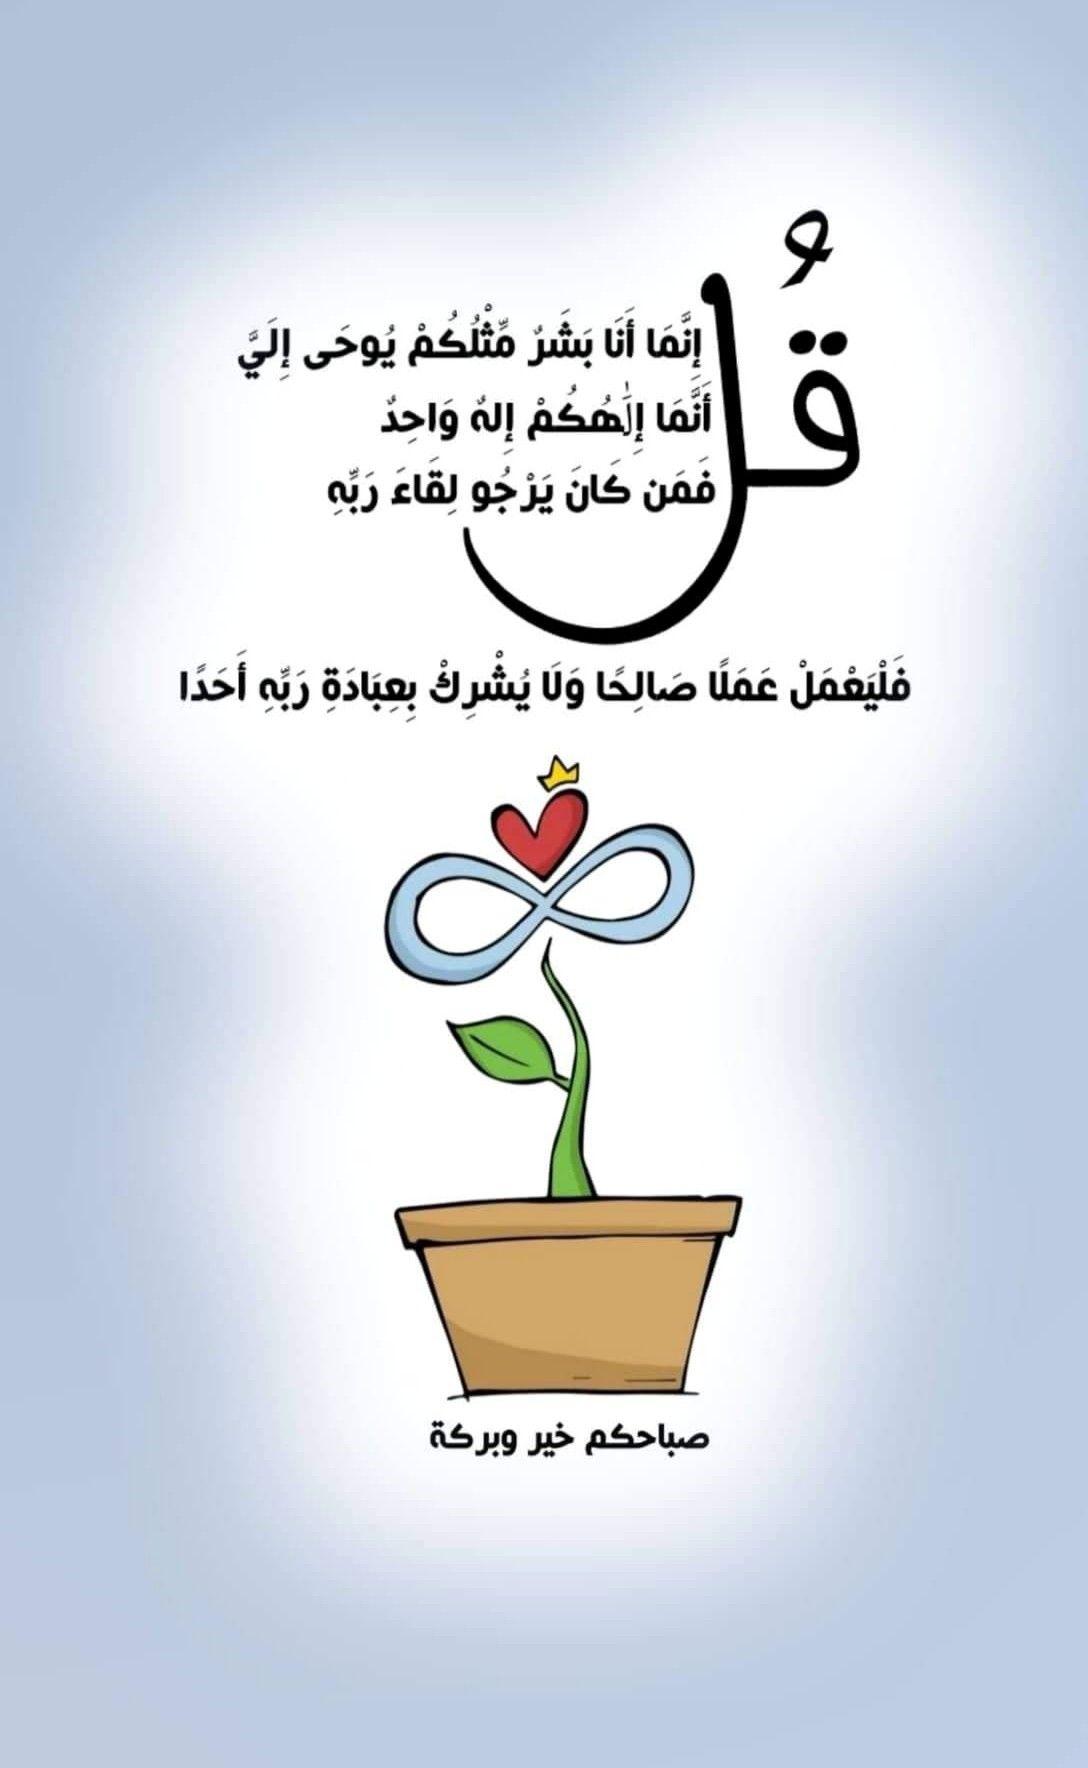 Long Swim Skort In 2021 Morning Words Good Morning Arabic Good Morning Greetings